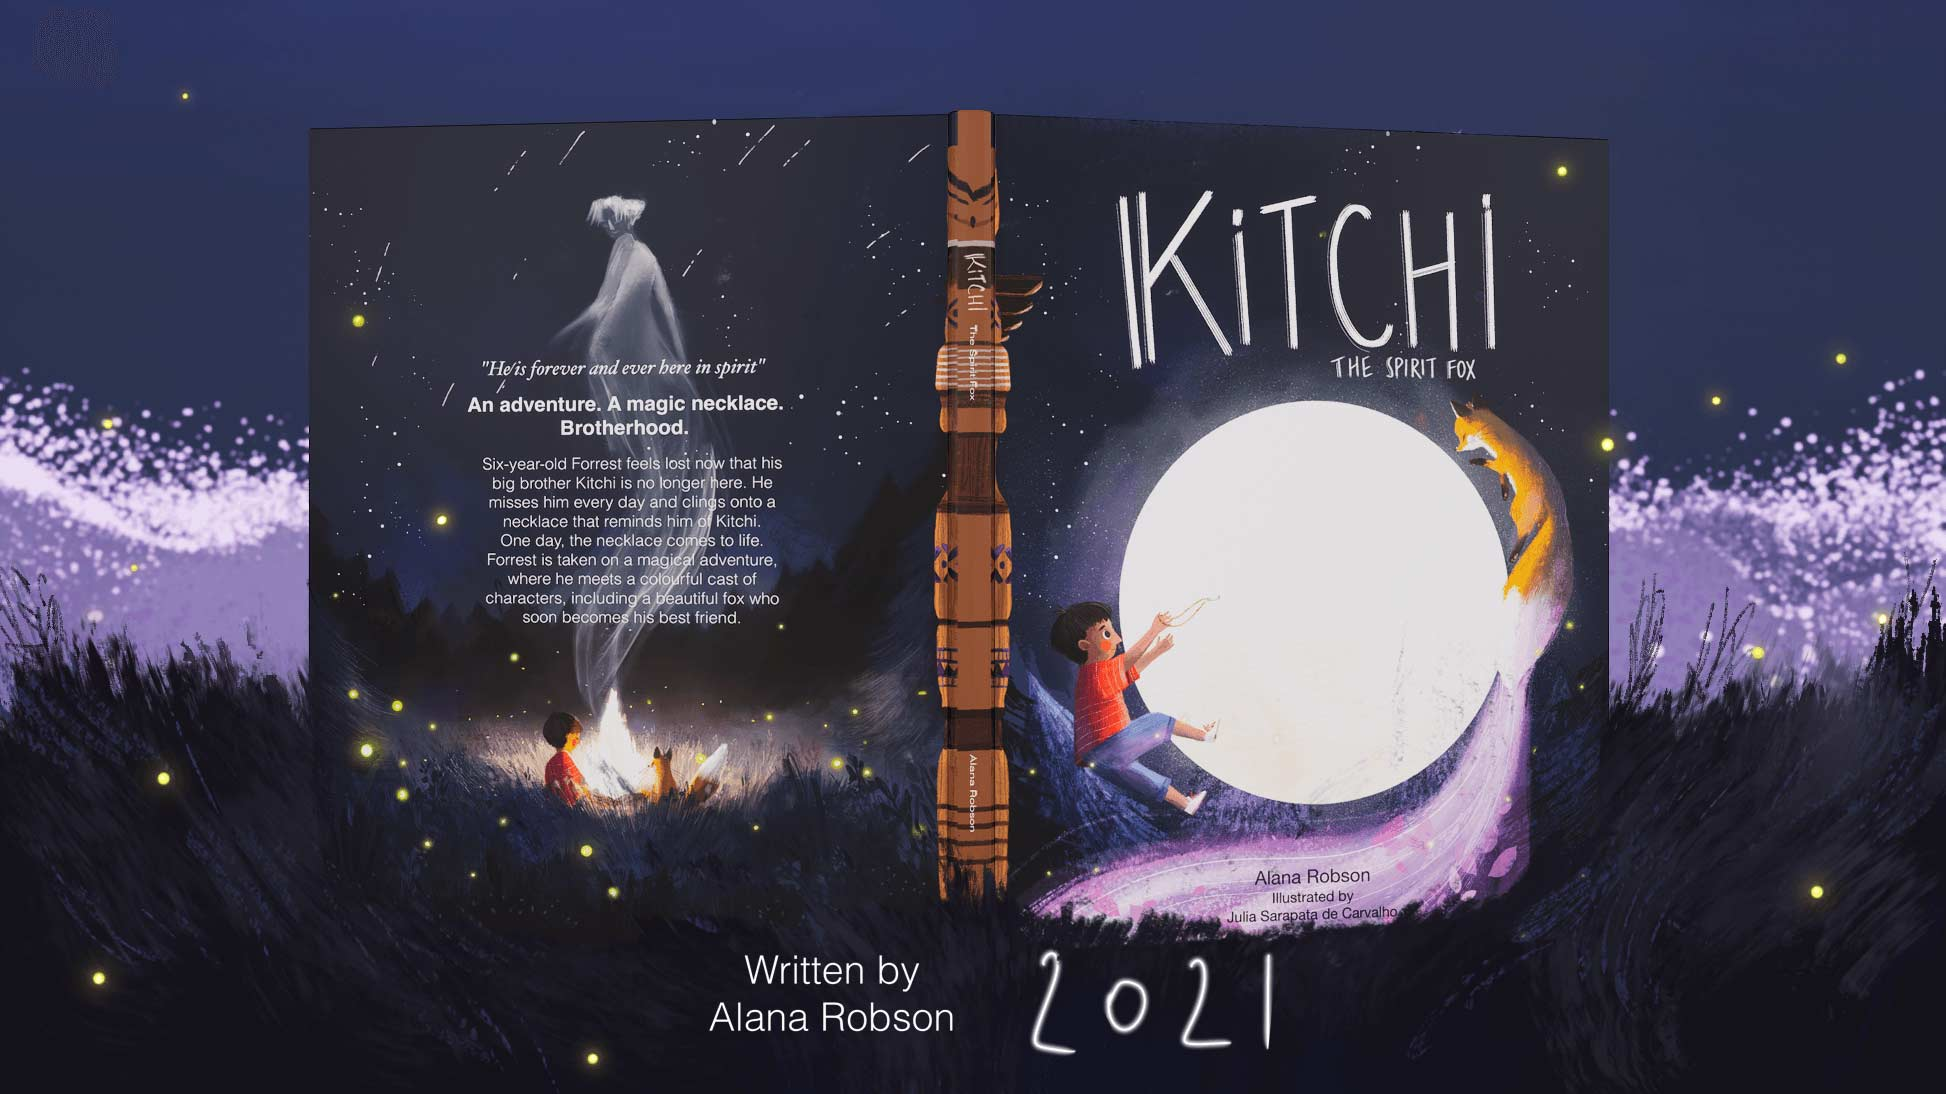 Kitchi The Spirit Fox Cover